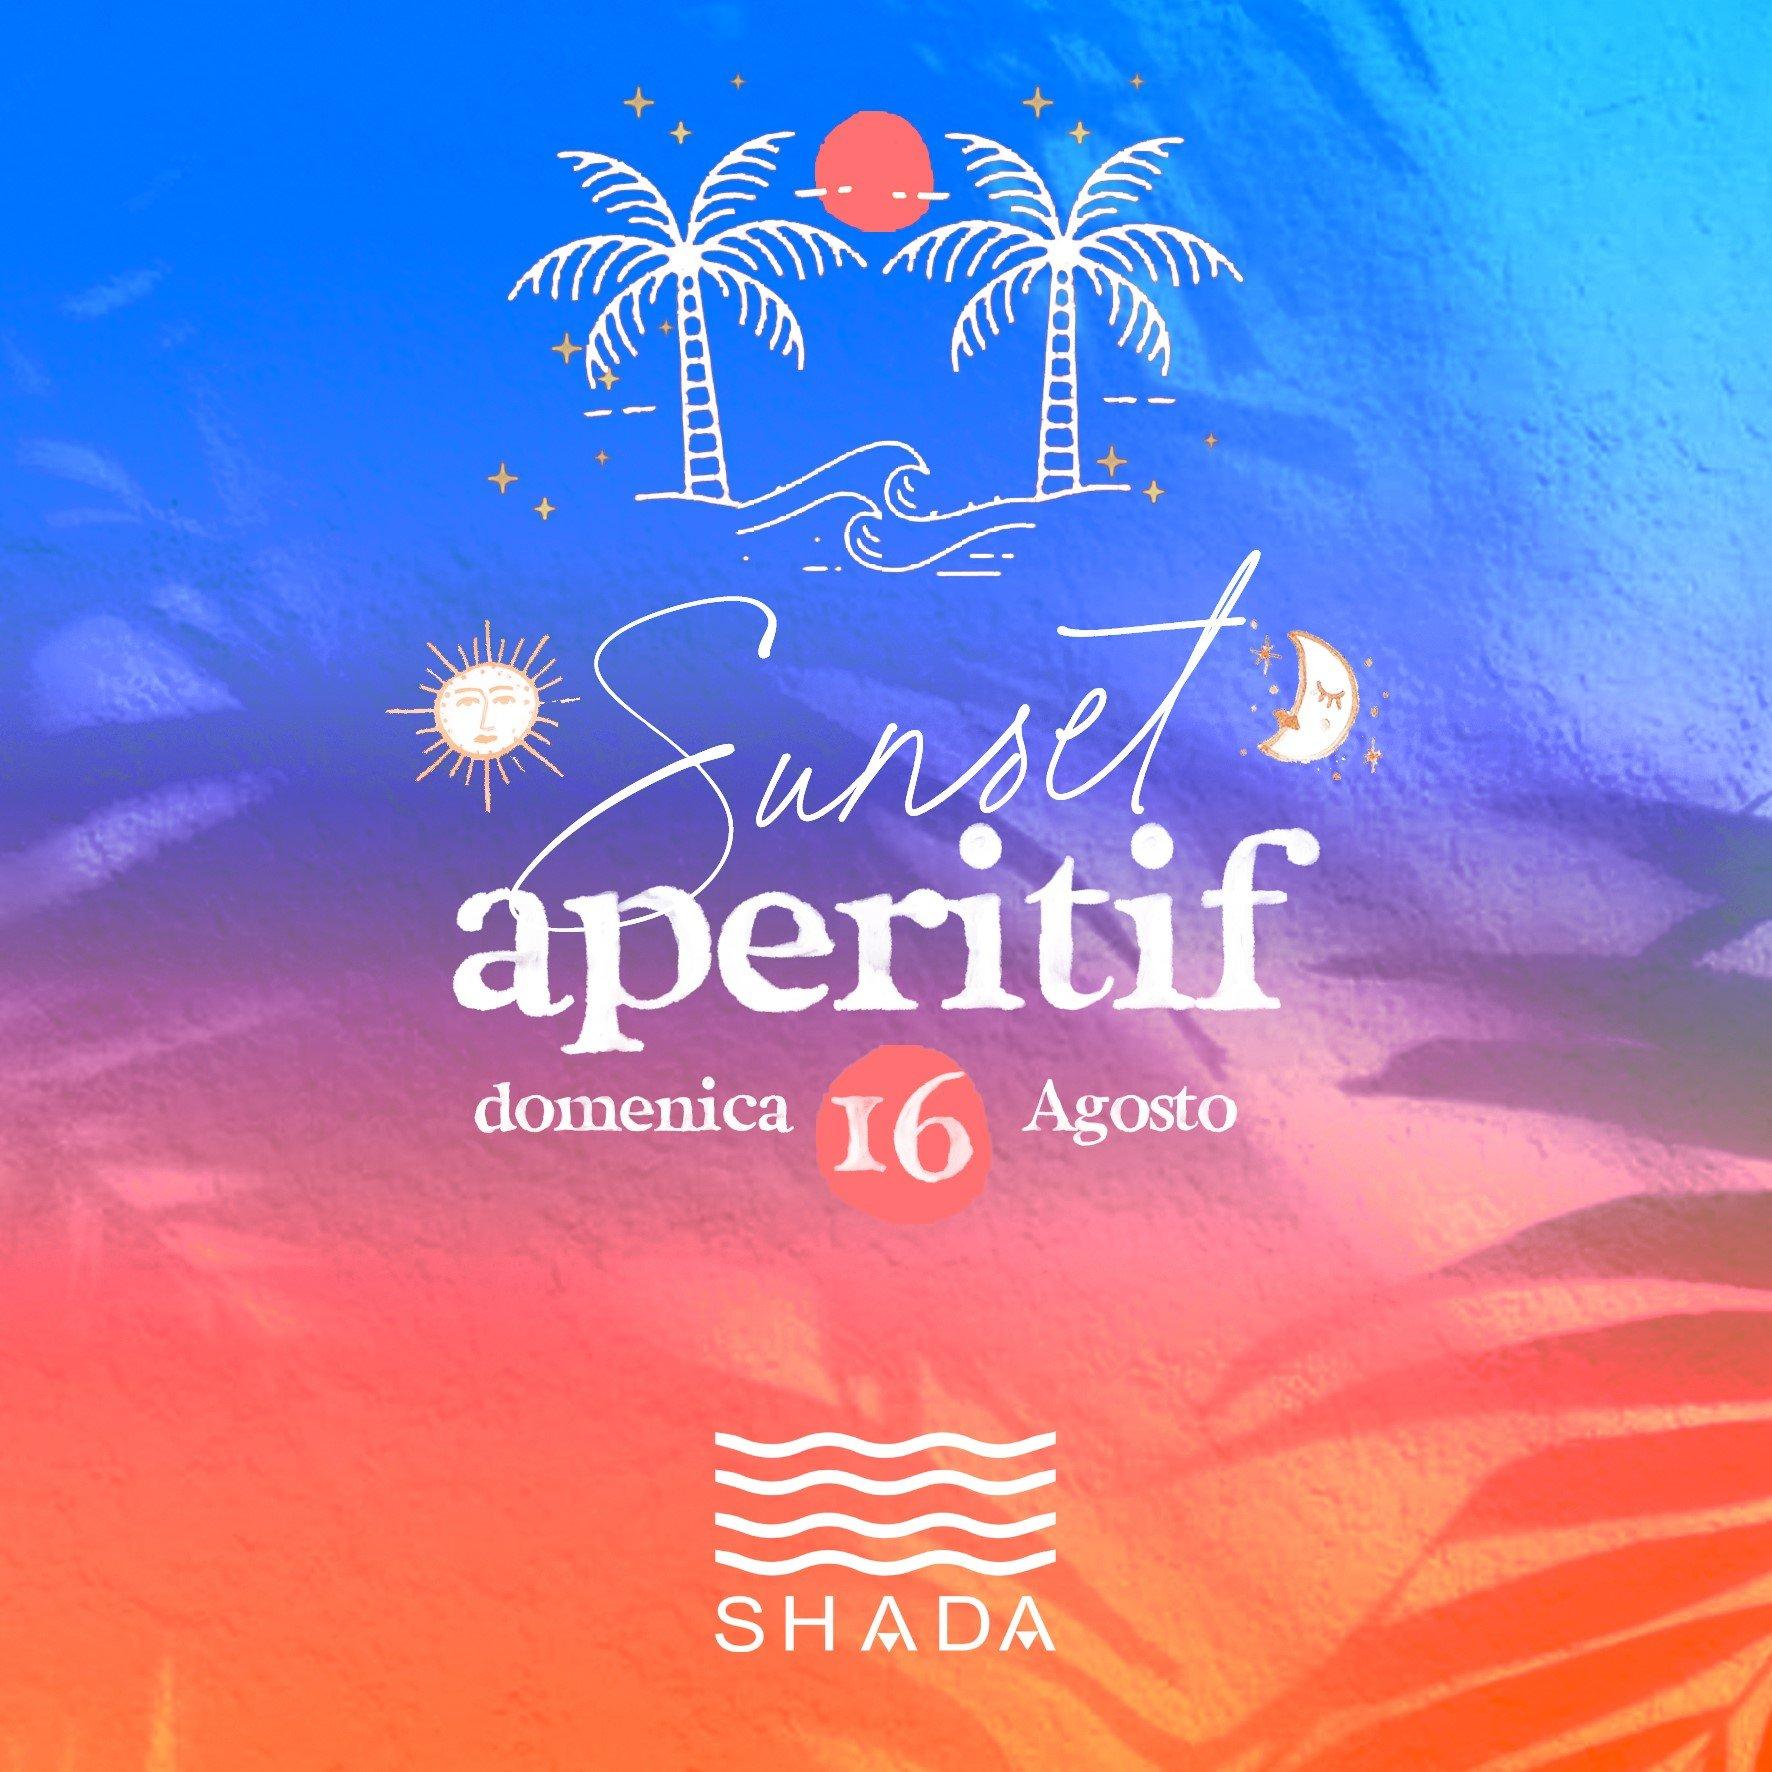 Discoteca Shada Civitanova Marche, Sunset Aperitif post Ferragosto